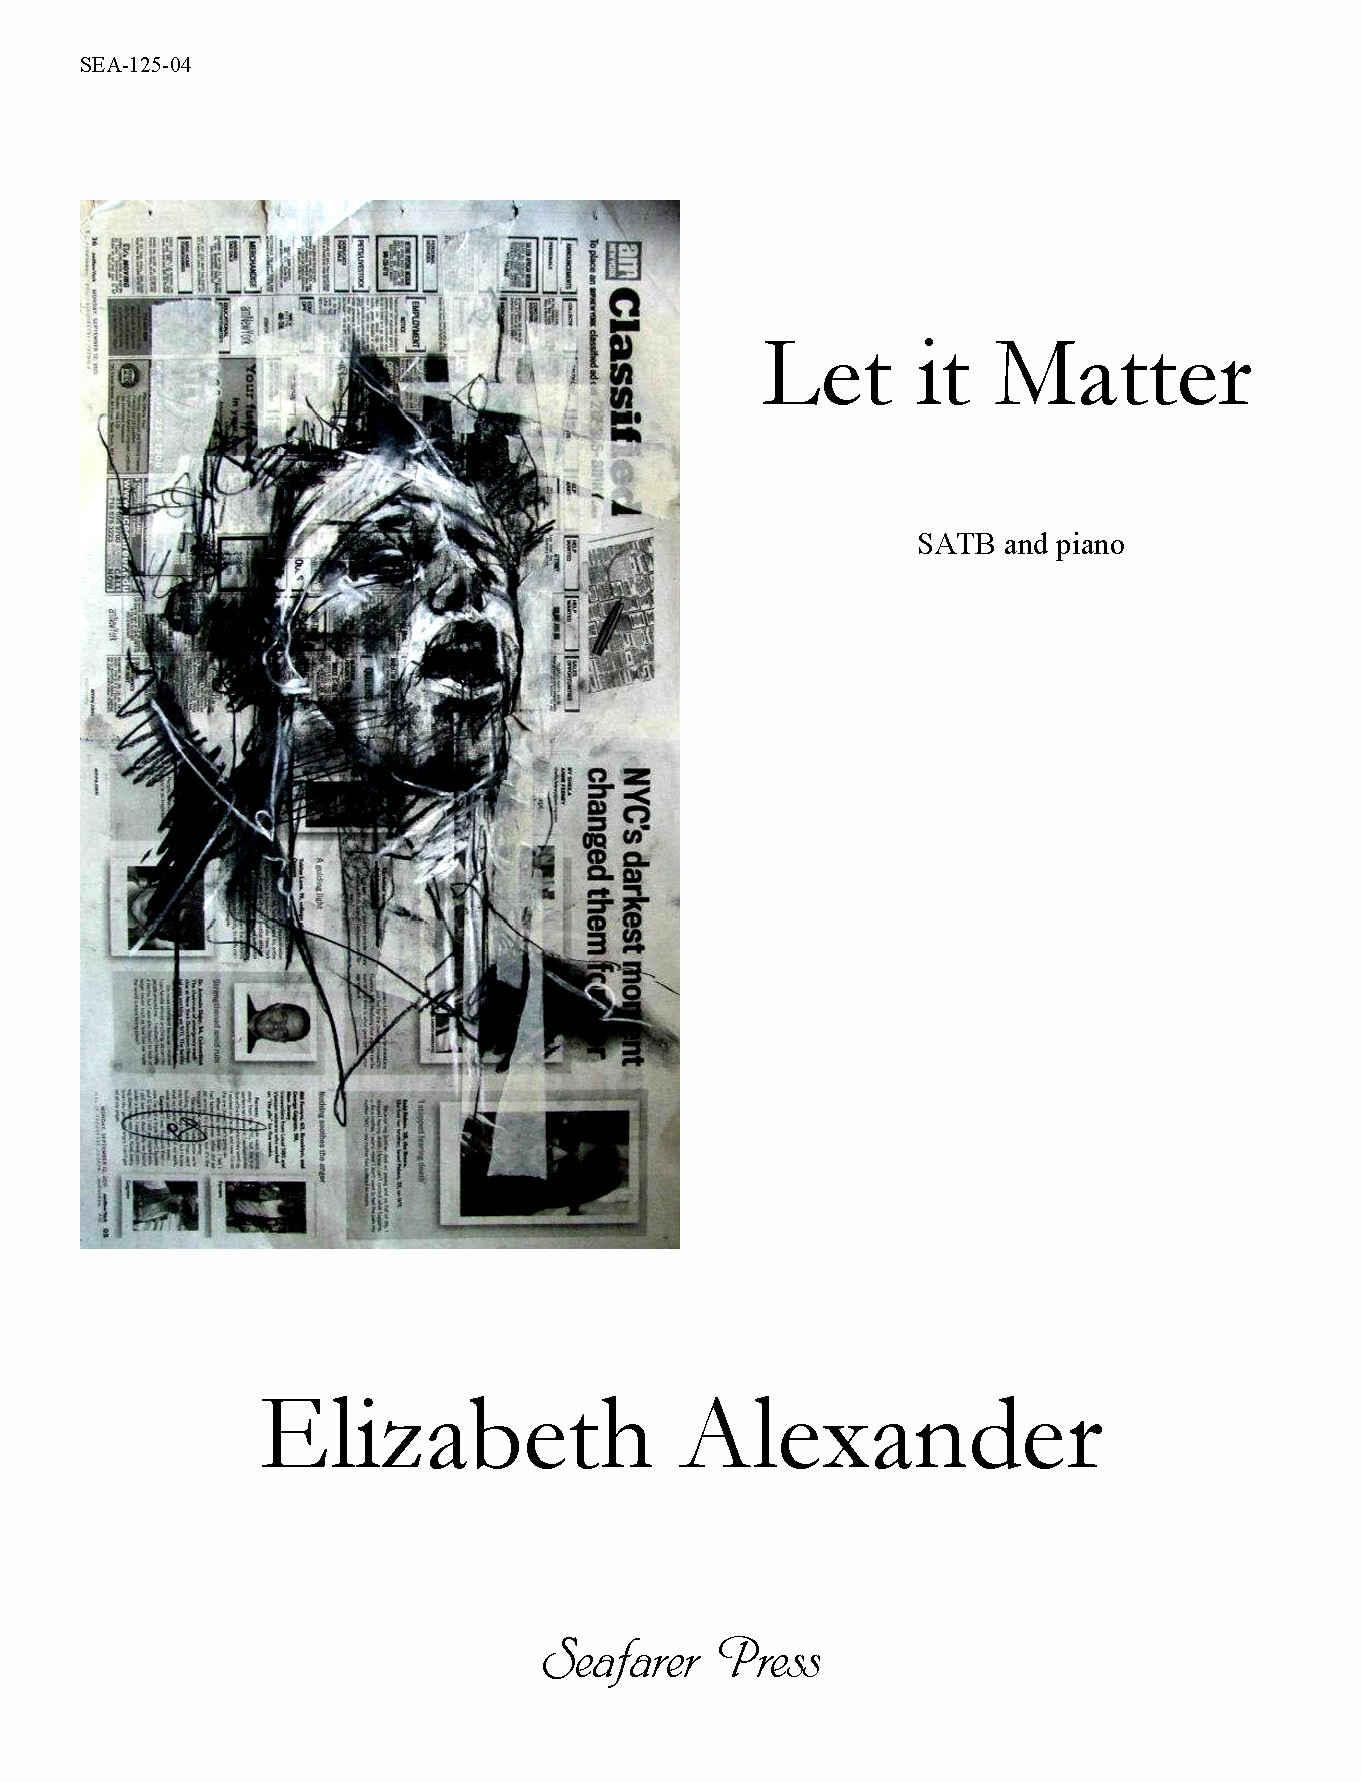 SEA-125-04 - Let it Matter (SATB)